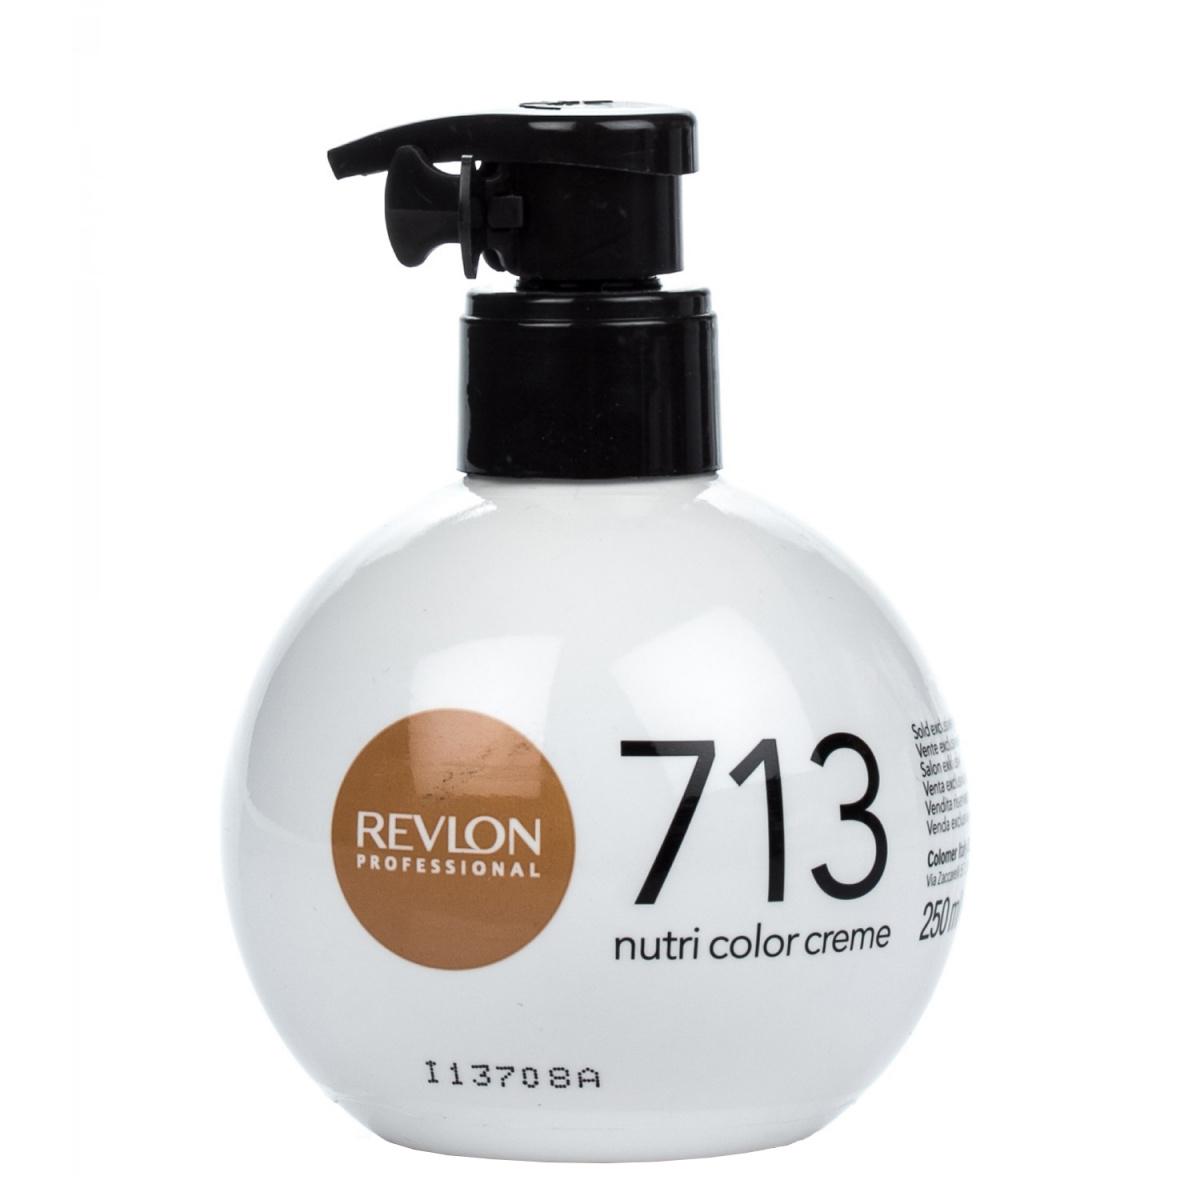 REVLON Крем-Краска Nutri Color Creme, 270 мл крем краска для волос indola color red